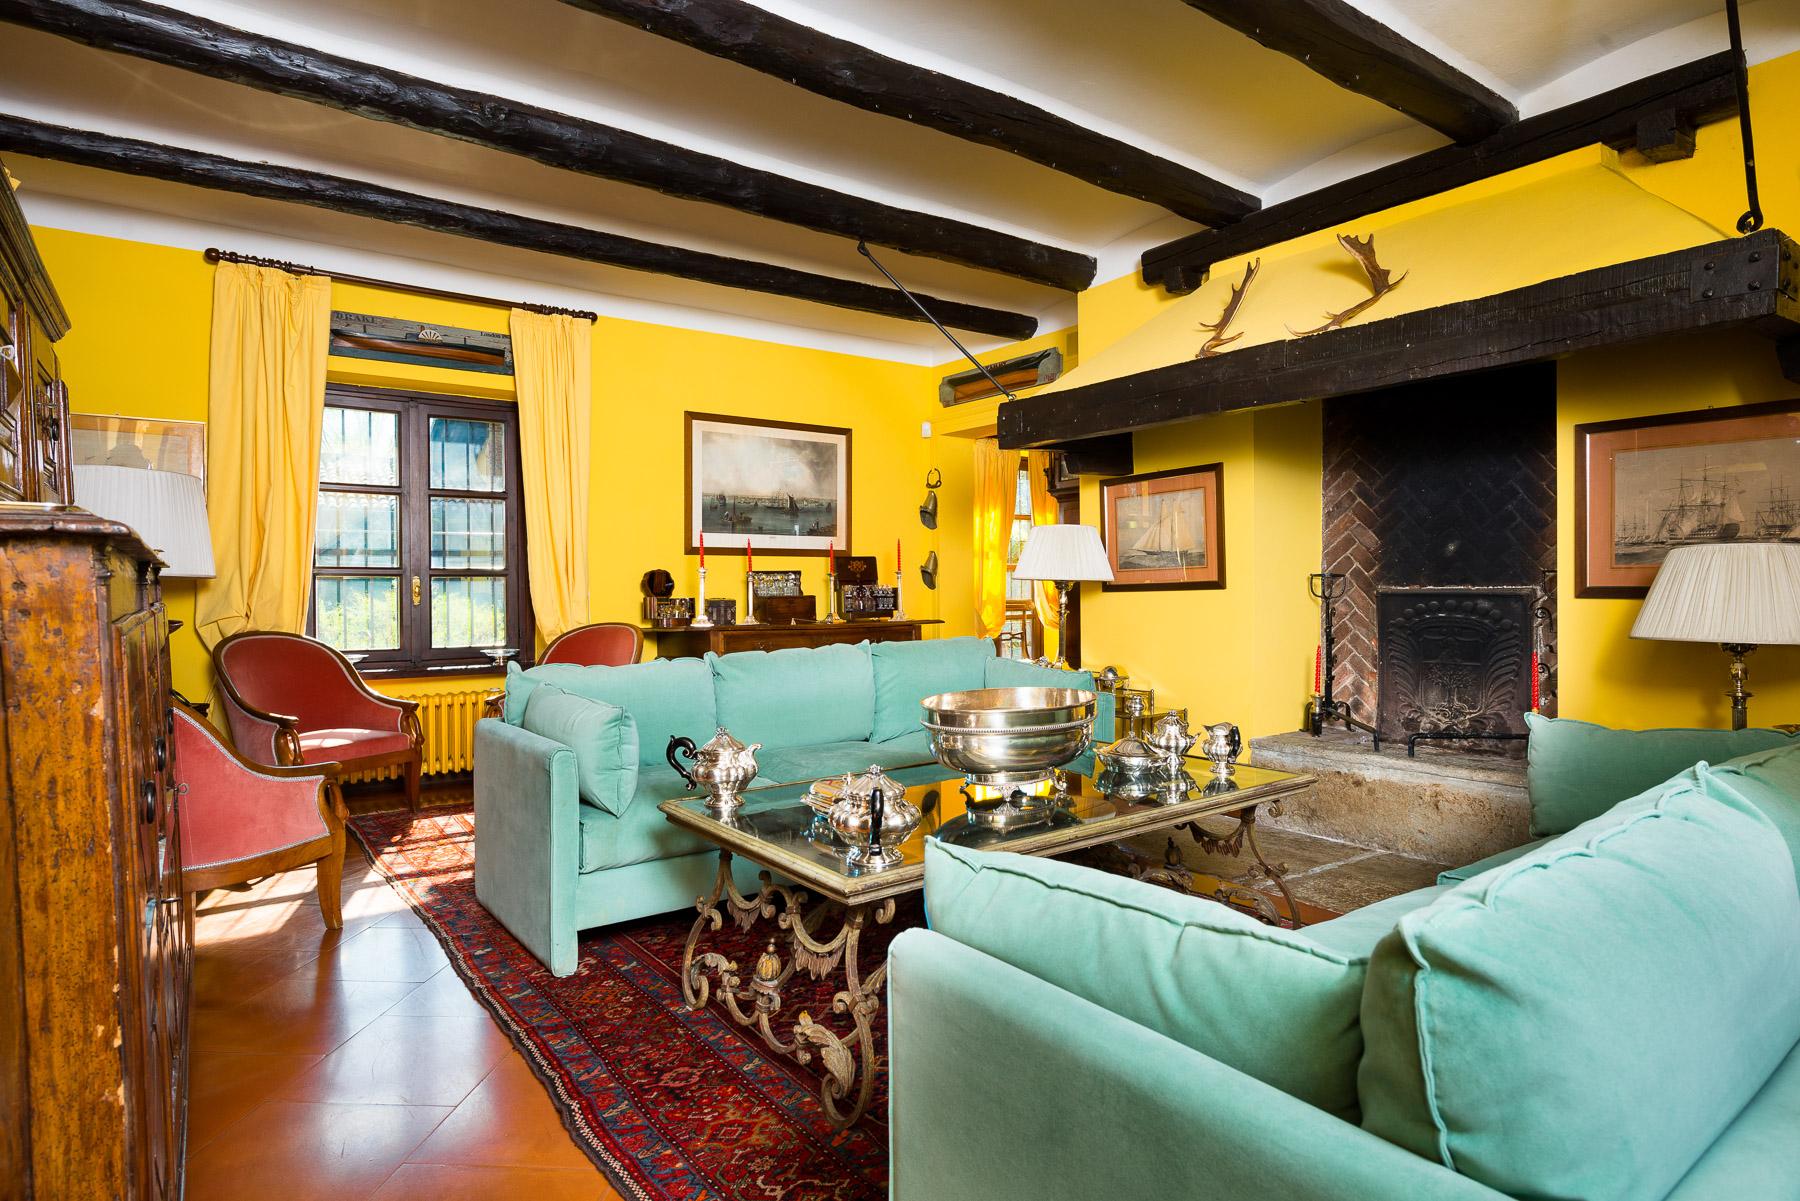 Casa indipendente in Vendita a Venaria: 5 locali, 500 mq - Foto 2